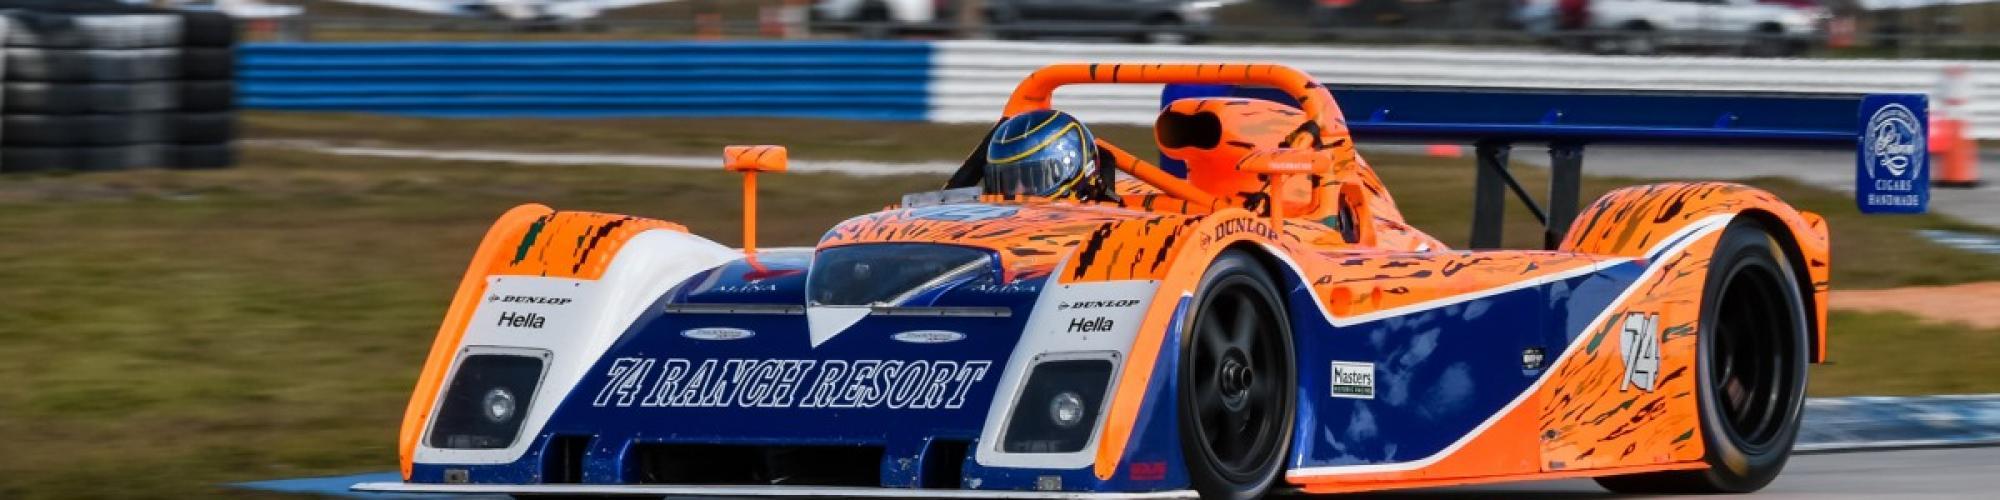 Greensall Motorsport Ltd cover image